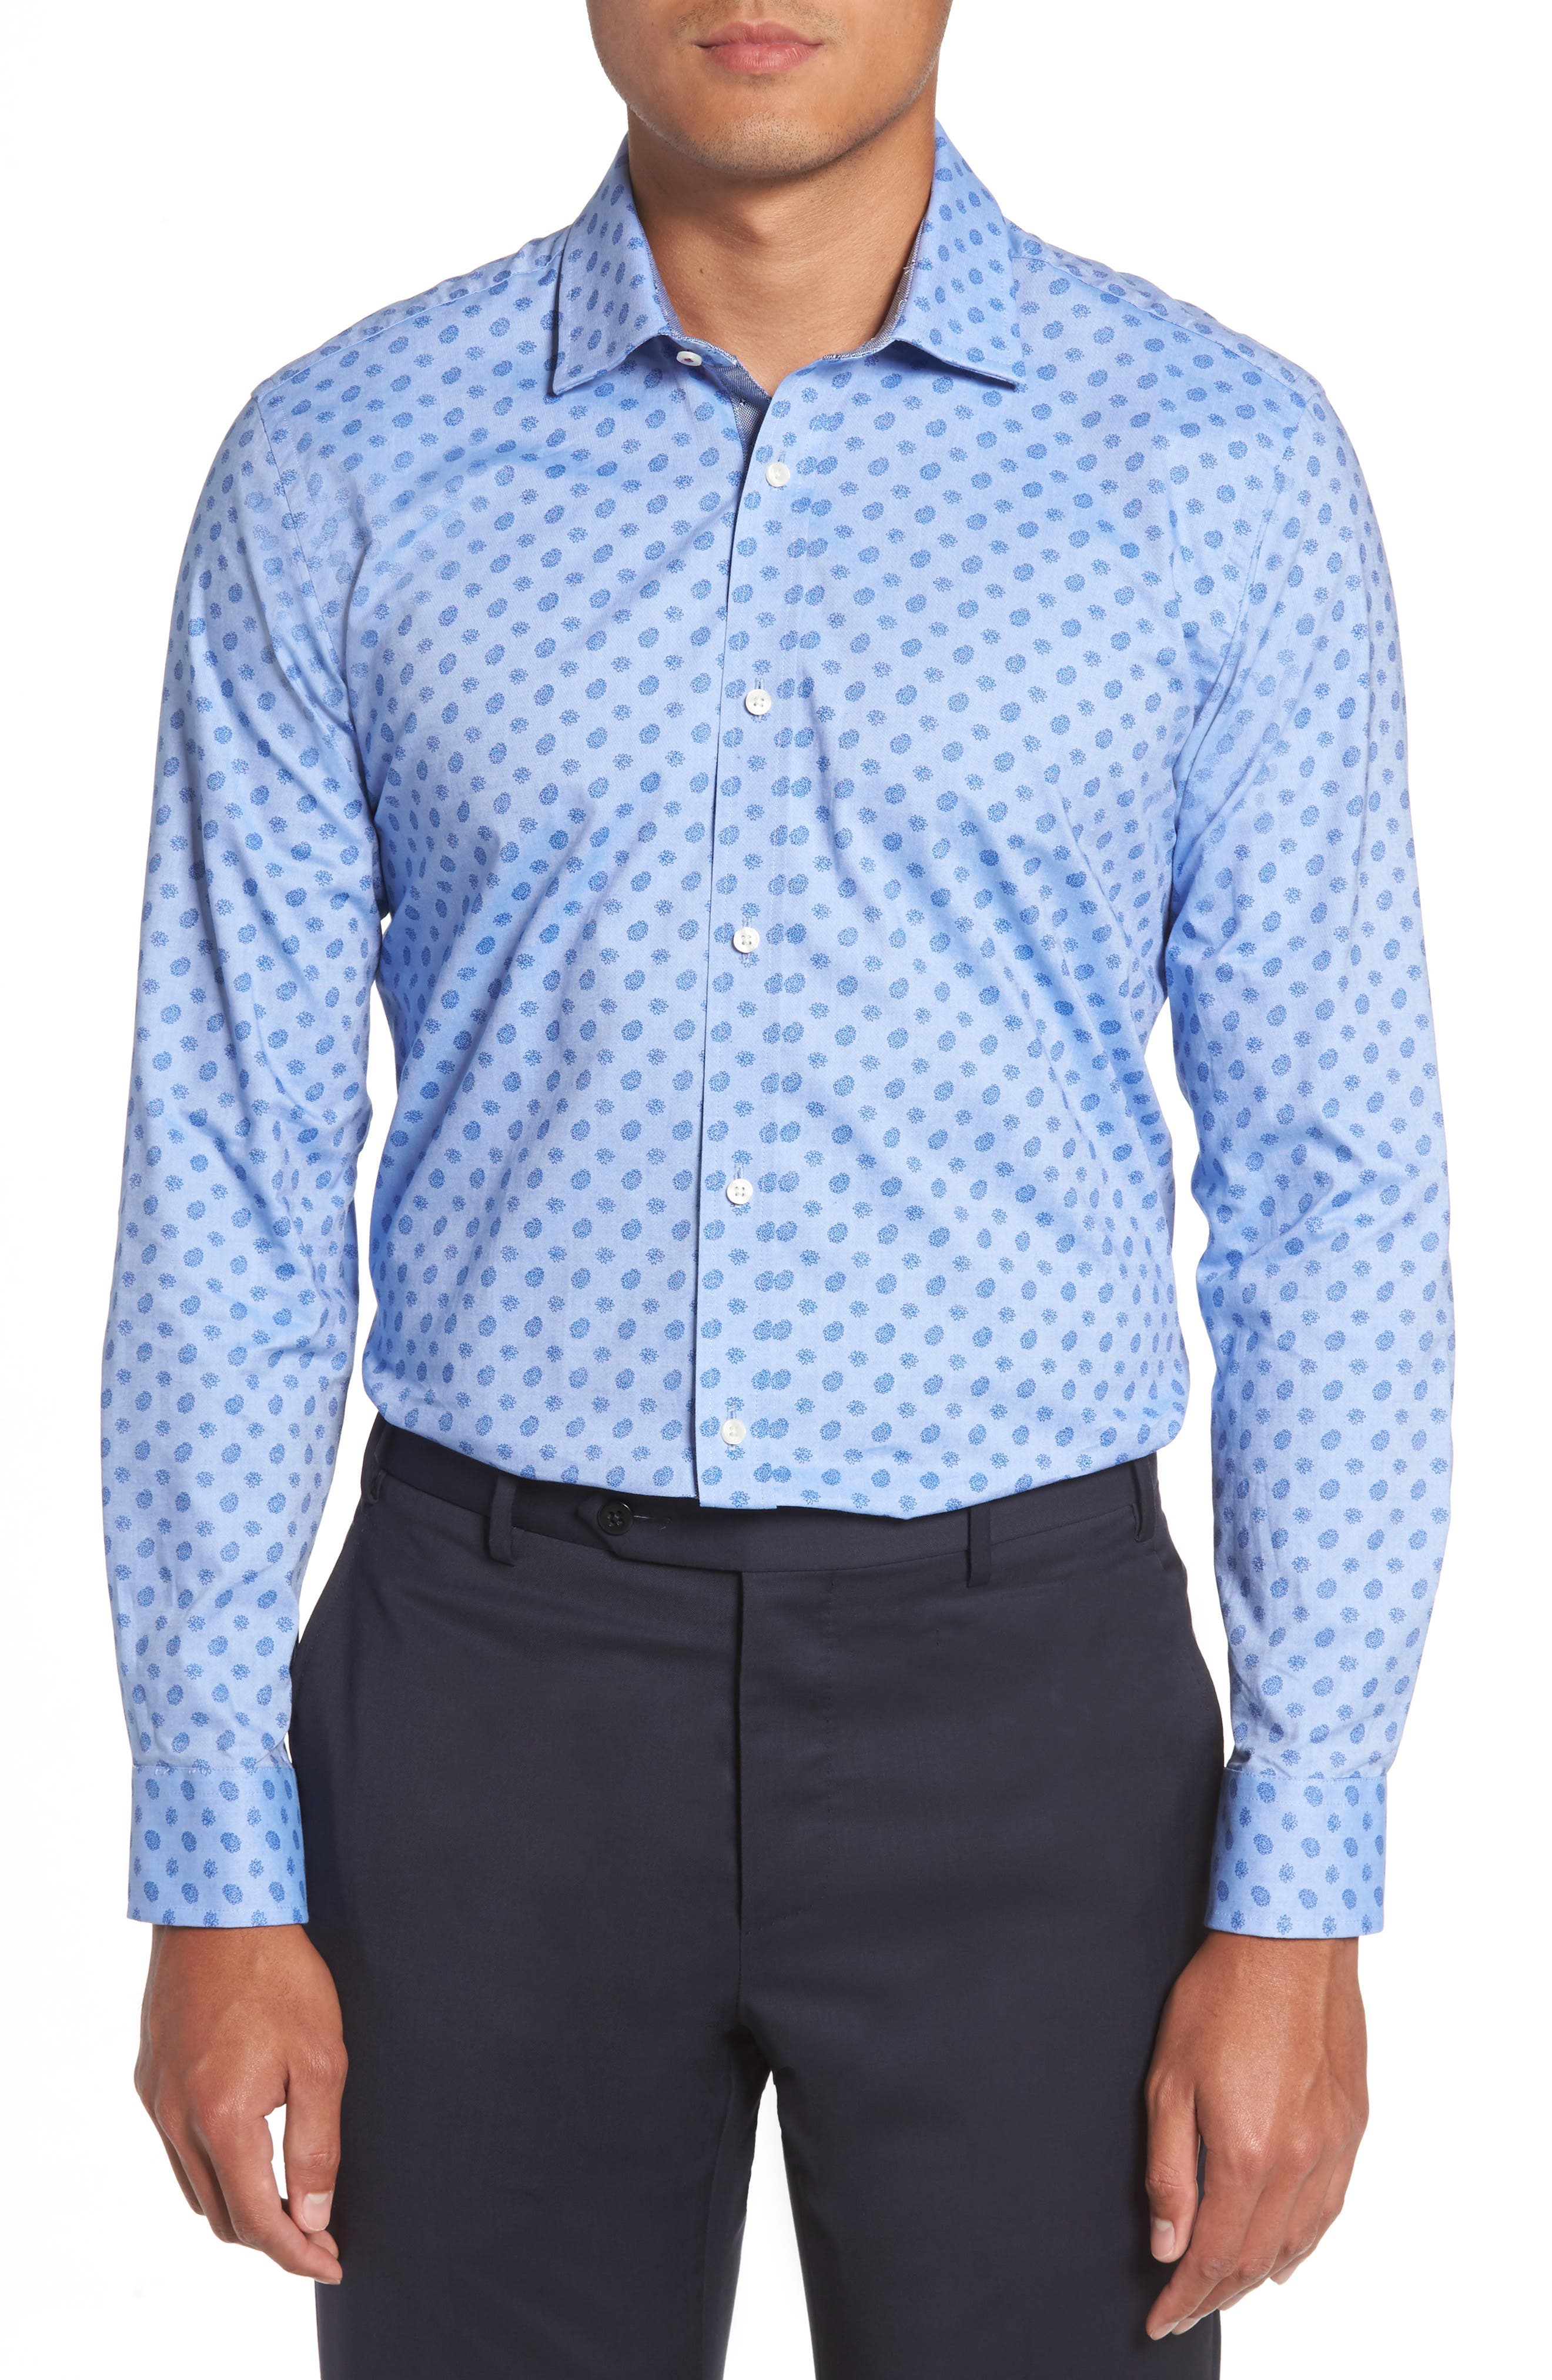 Midra Trim Fit Paisley Dress Shirt,                             Alternate thumbnail 2, color,                             Blue